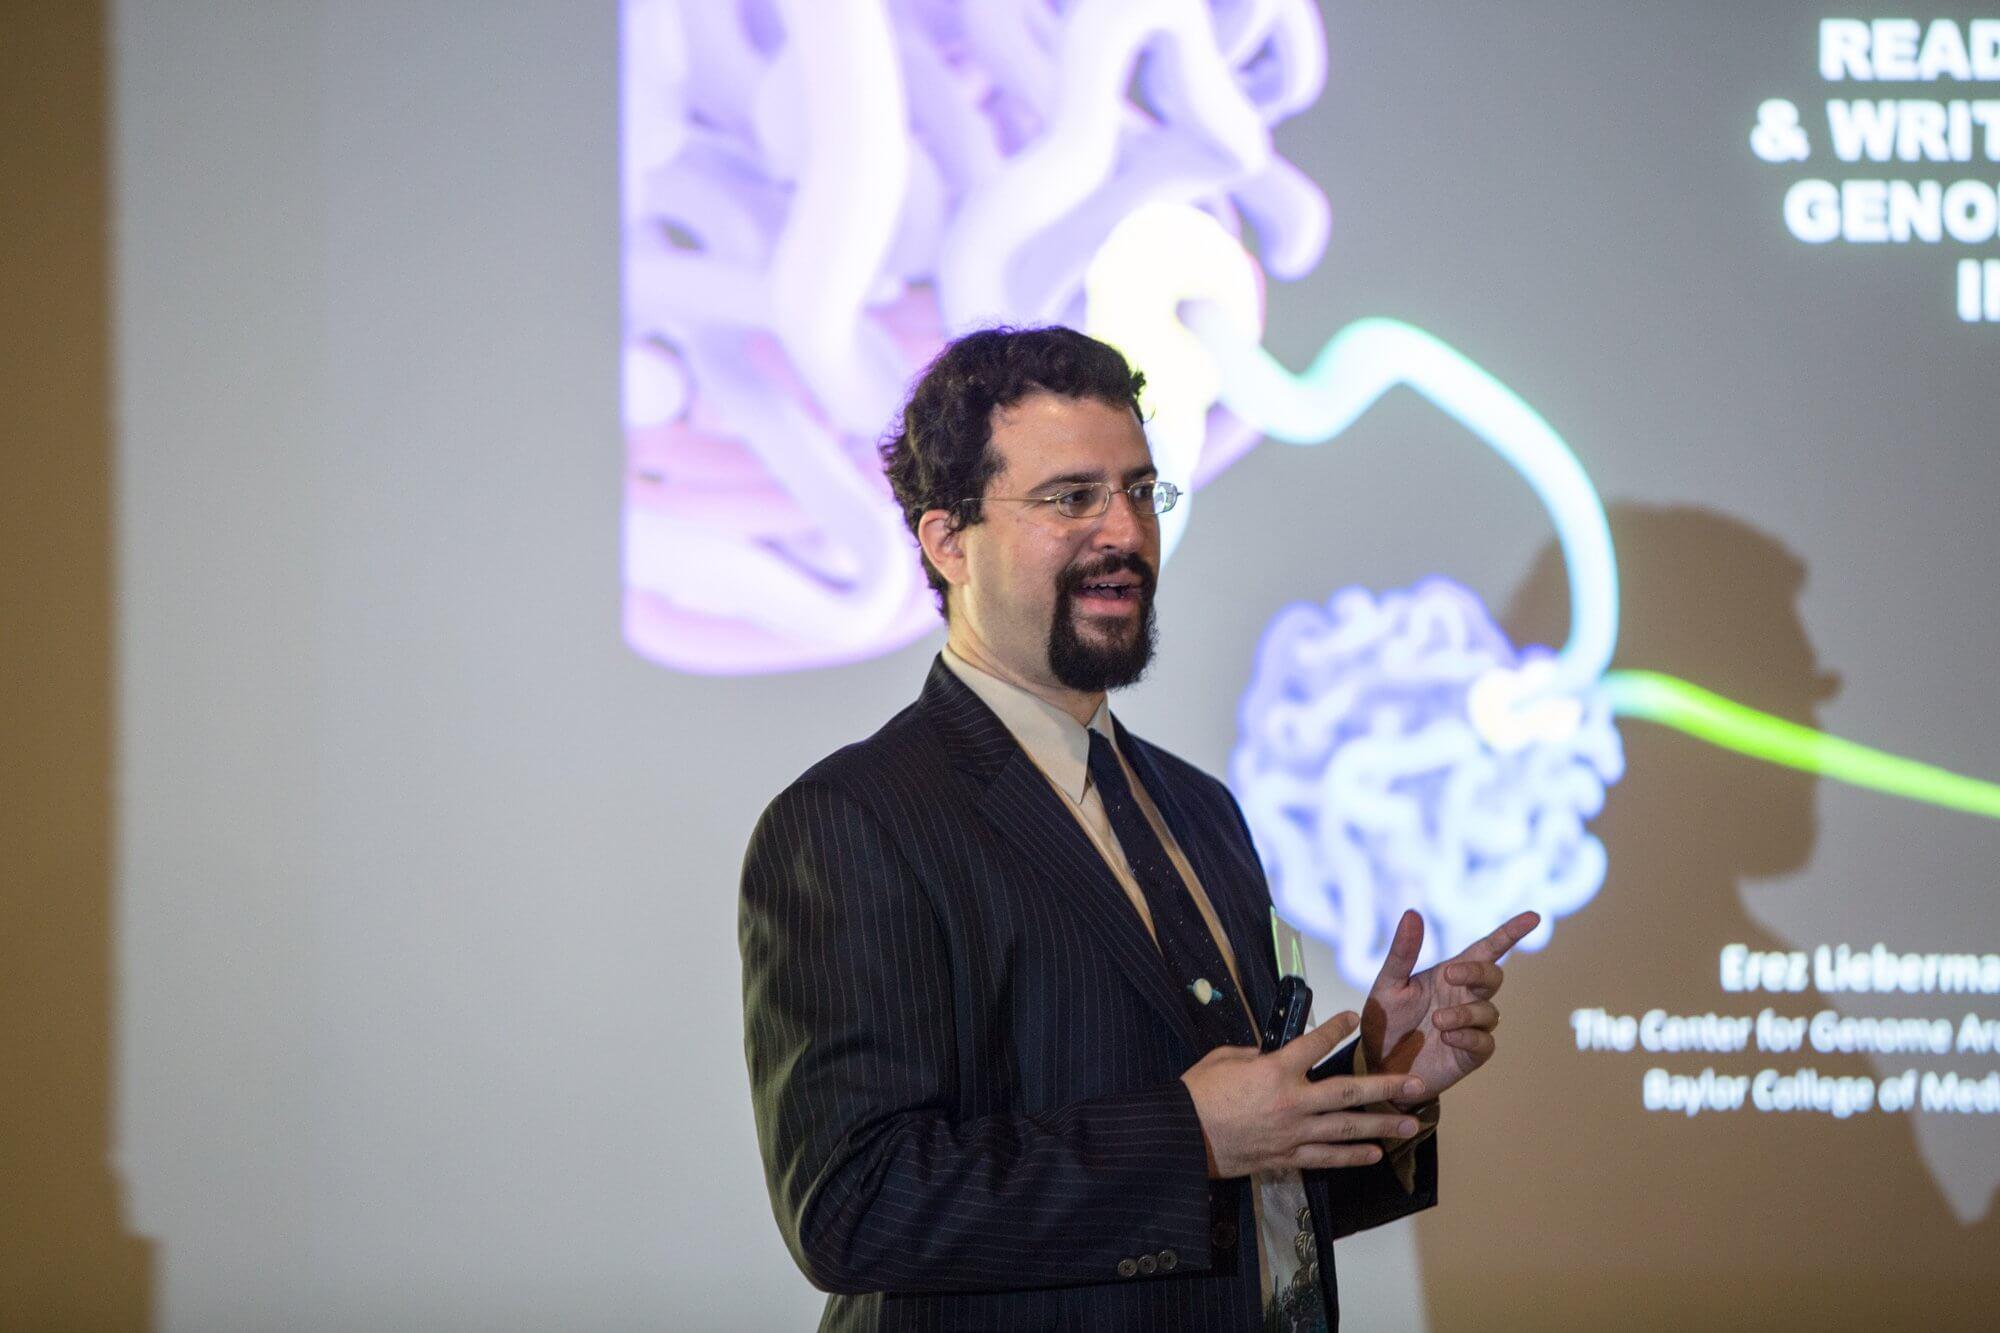 Erez Lieberman Aiden, Ph.D., assistant professor of molecular and human genetics at Baylor College of Medicine.